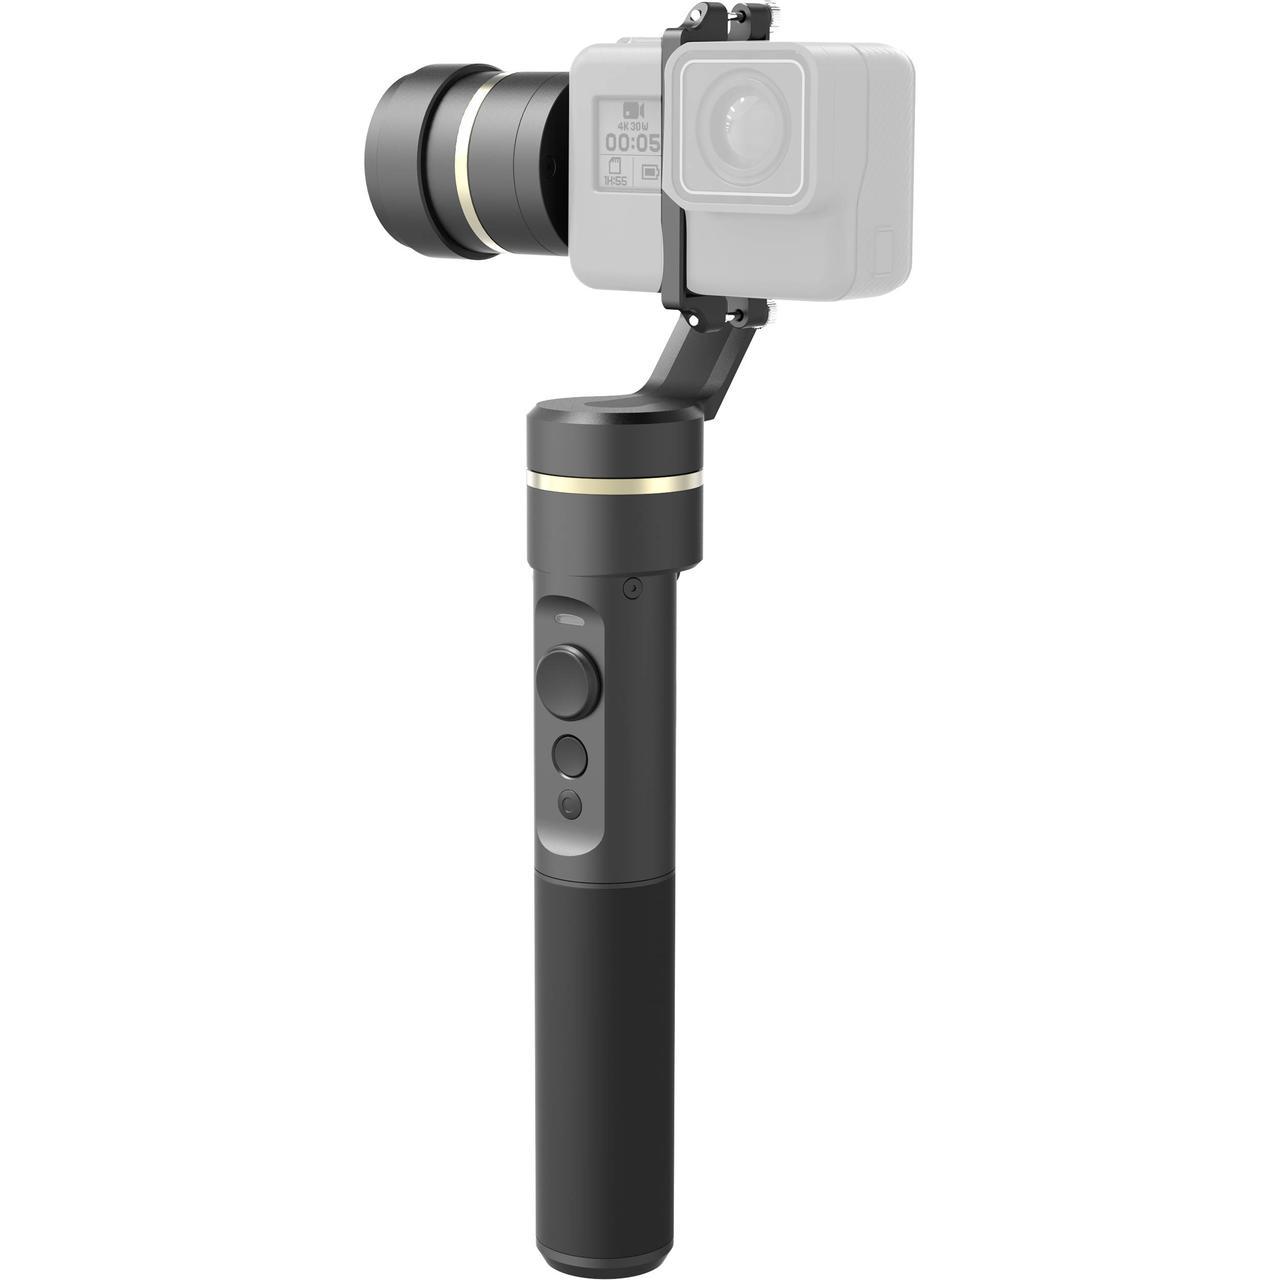 Ручной 3-х осевой стедикам Feiyu G5 Handheld Gimbal for GoPro HERO6  HERO5  HERO4 (FYG5)